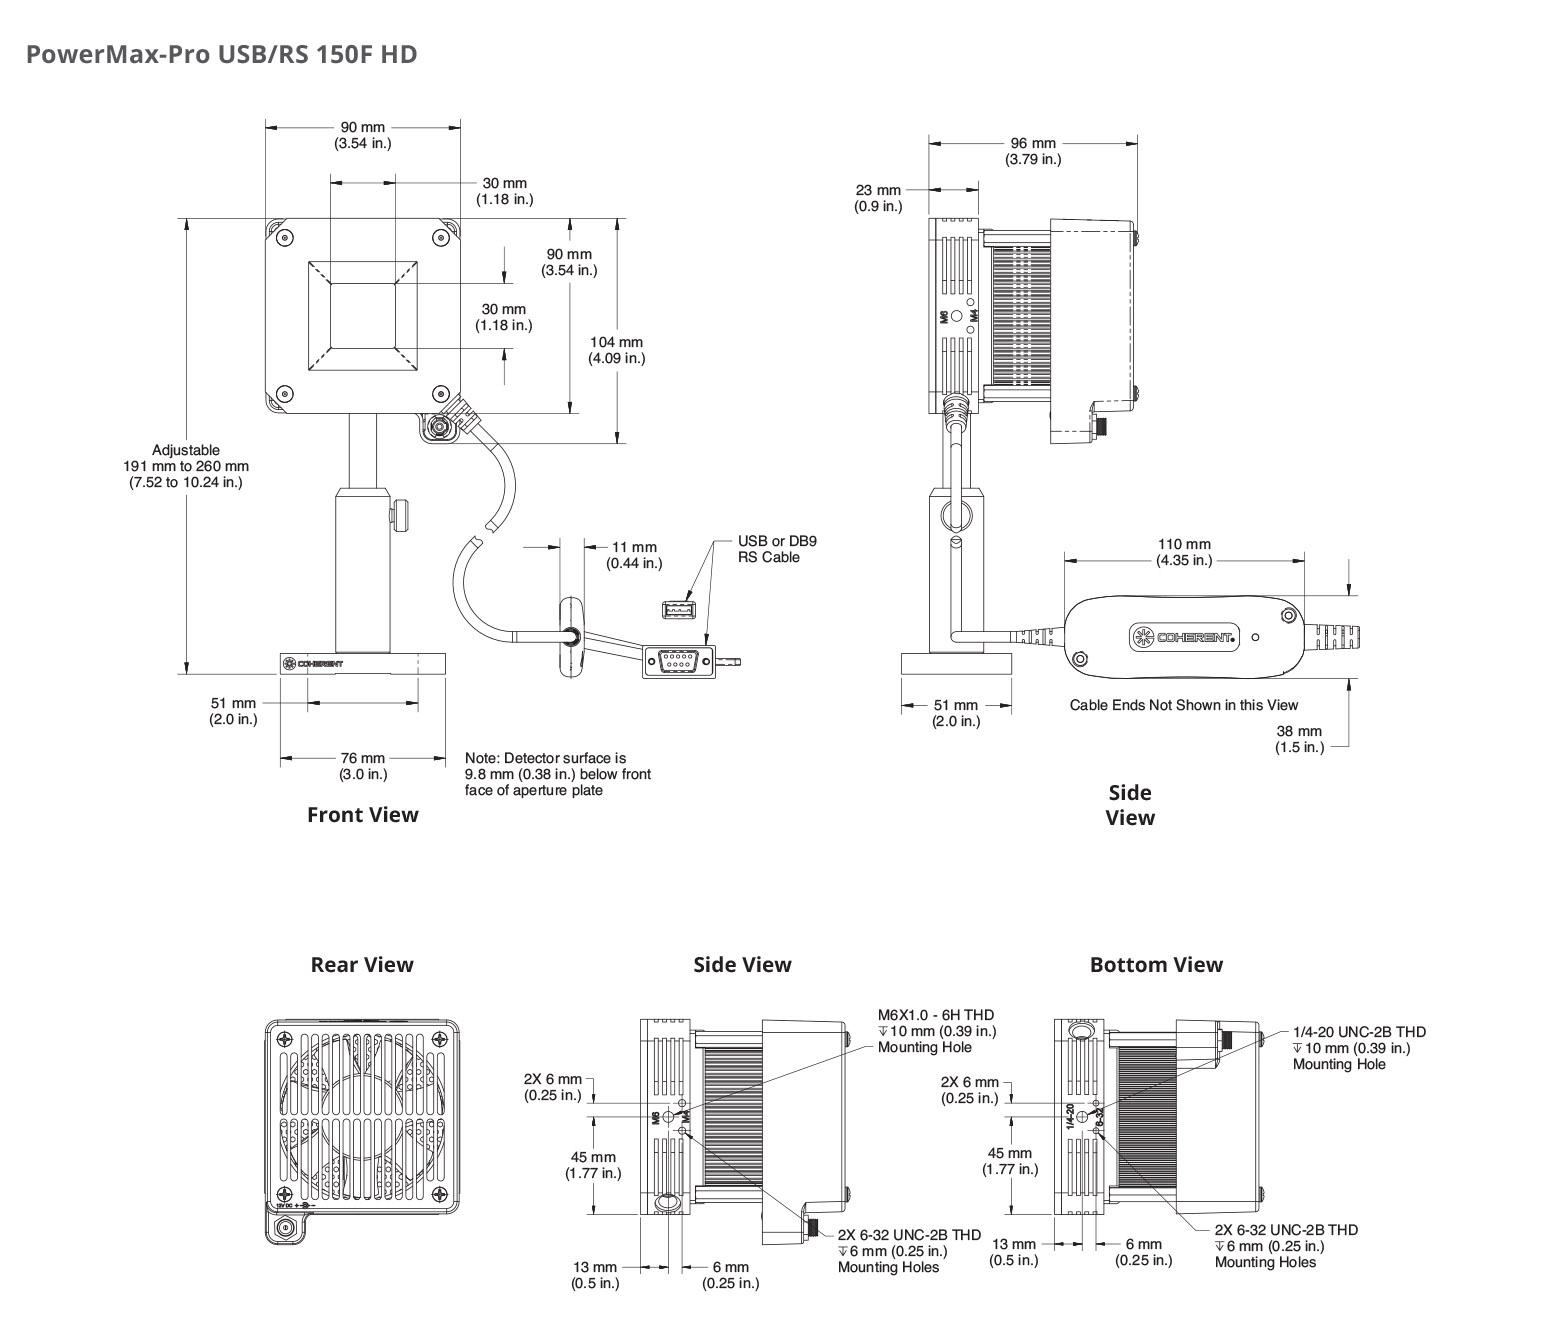 ... powermax pro usbrs sensors cohe powermax pro 150f hd drawing powermax pro usb rs sensors powermax · procare 1000 wiring diagram ...